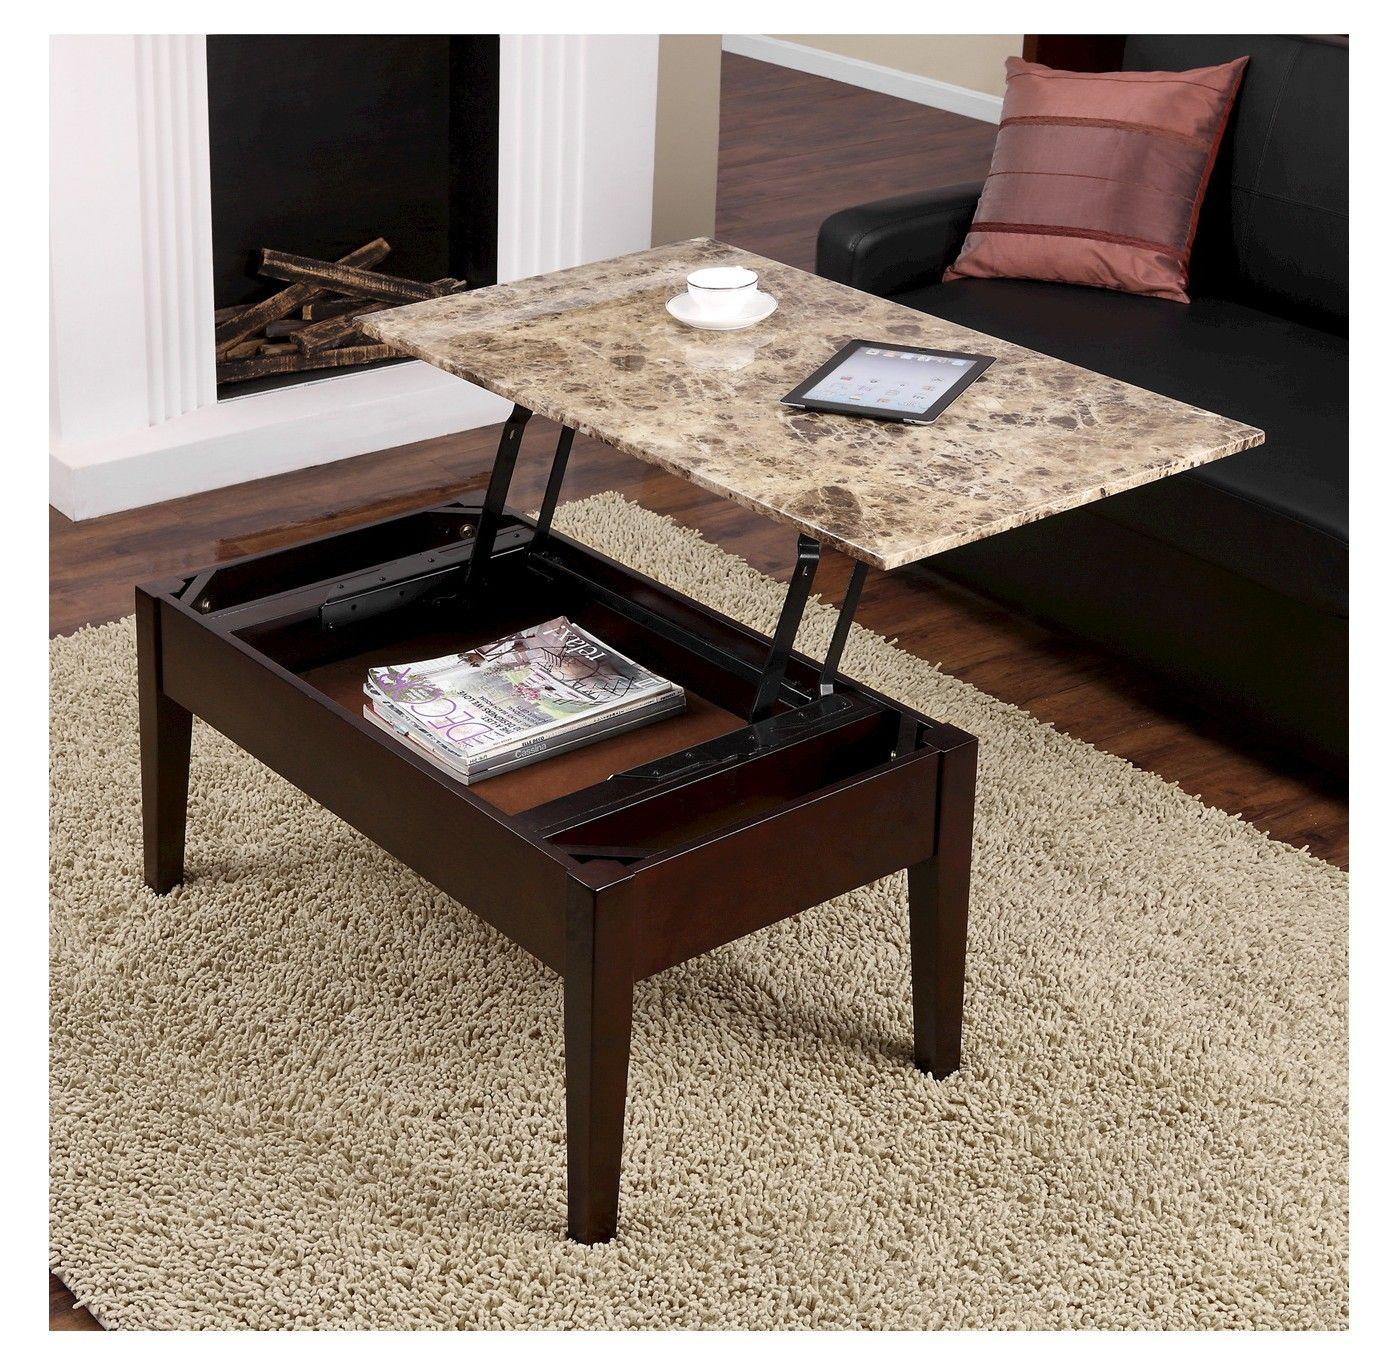 Dorel faux marble lift top table brown dorel living